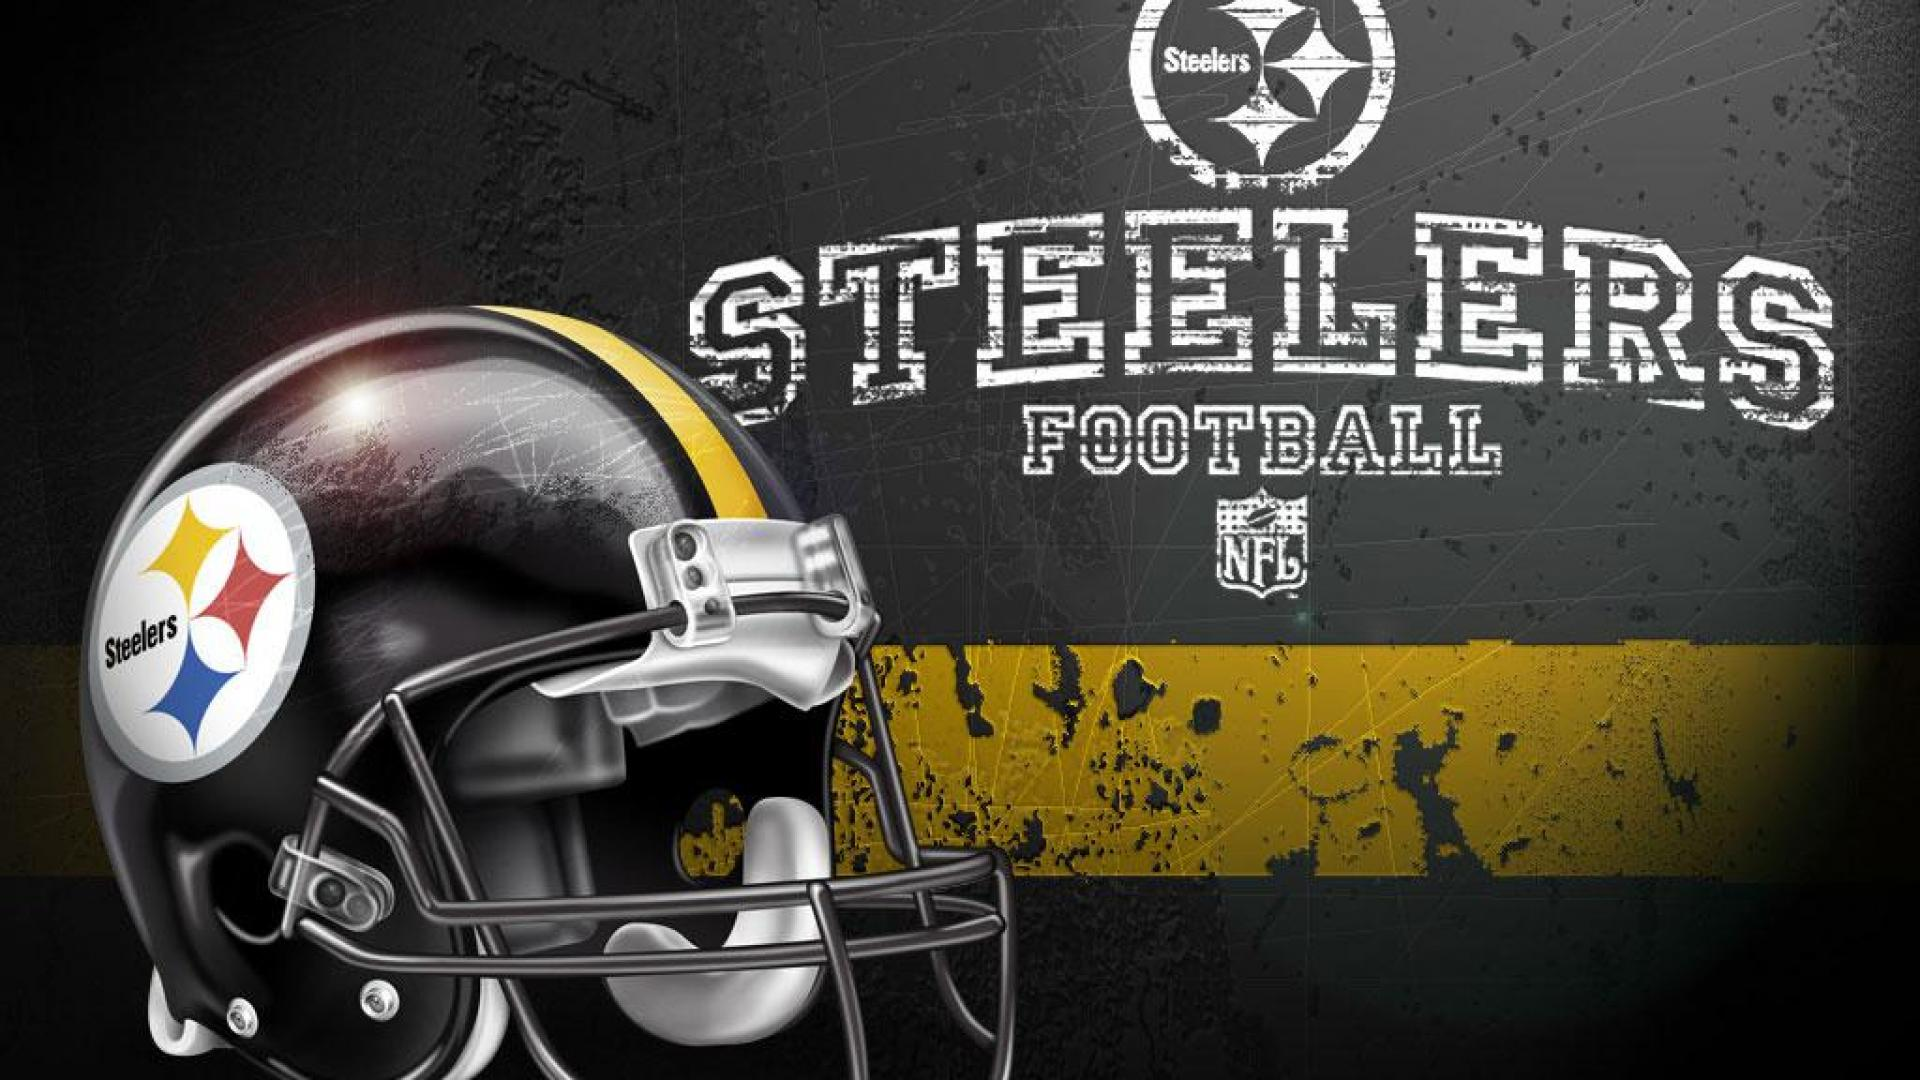 Art Images Pittsburgh Steelers Wallpaper Hd Pittsburgh Steelers 1920x1080 Download Hd Wallpaper Wallpapertip